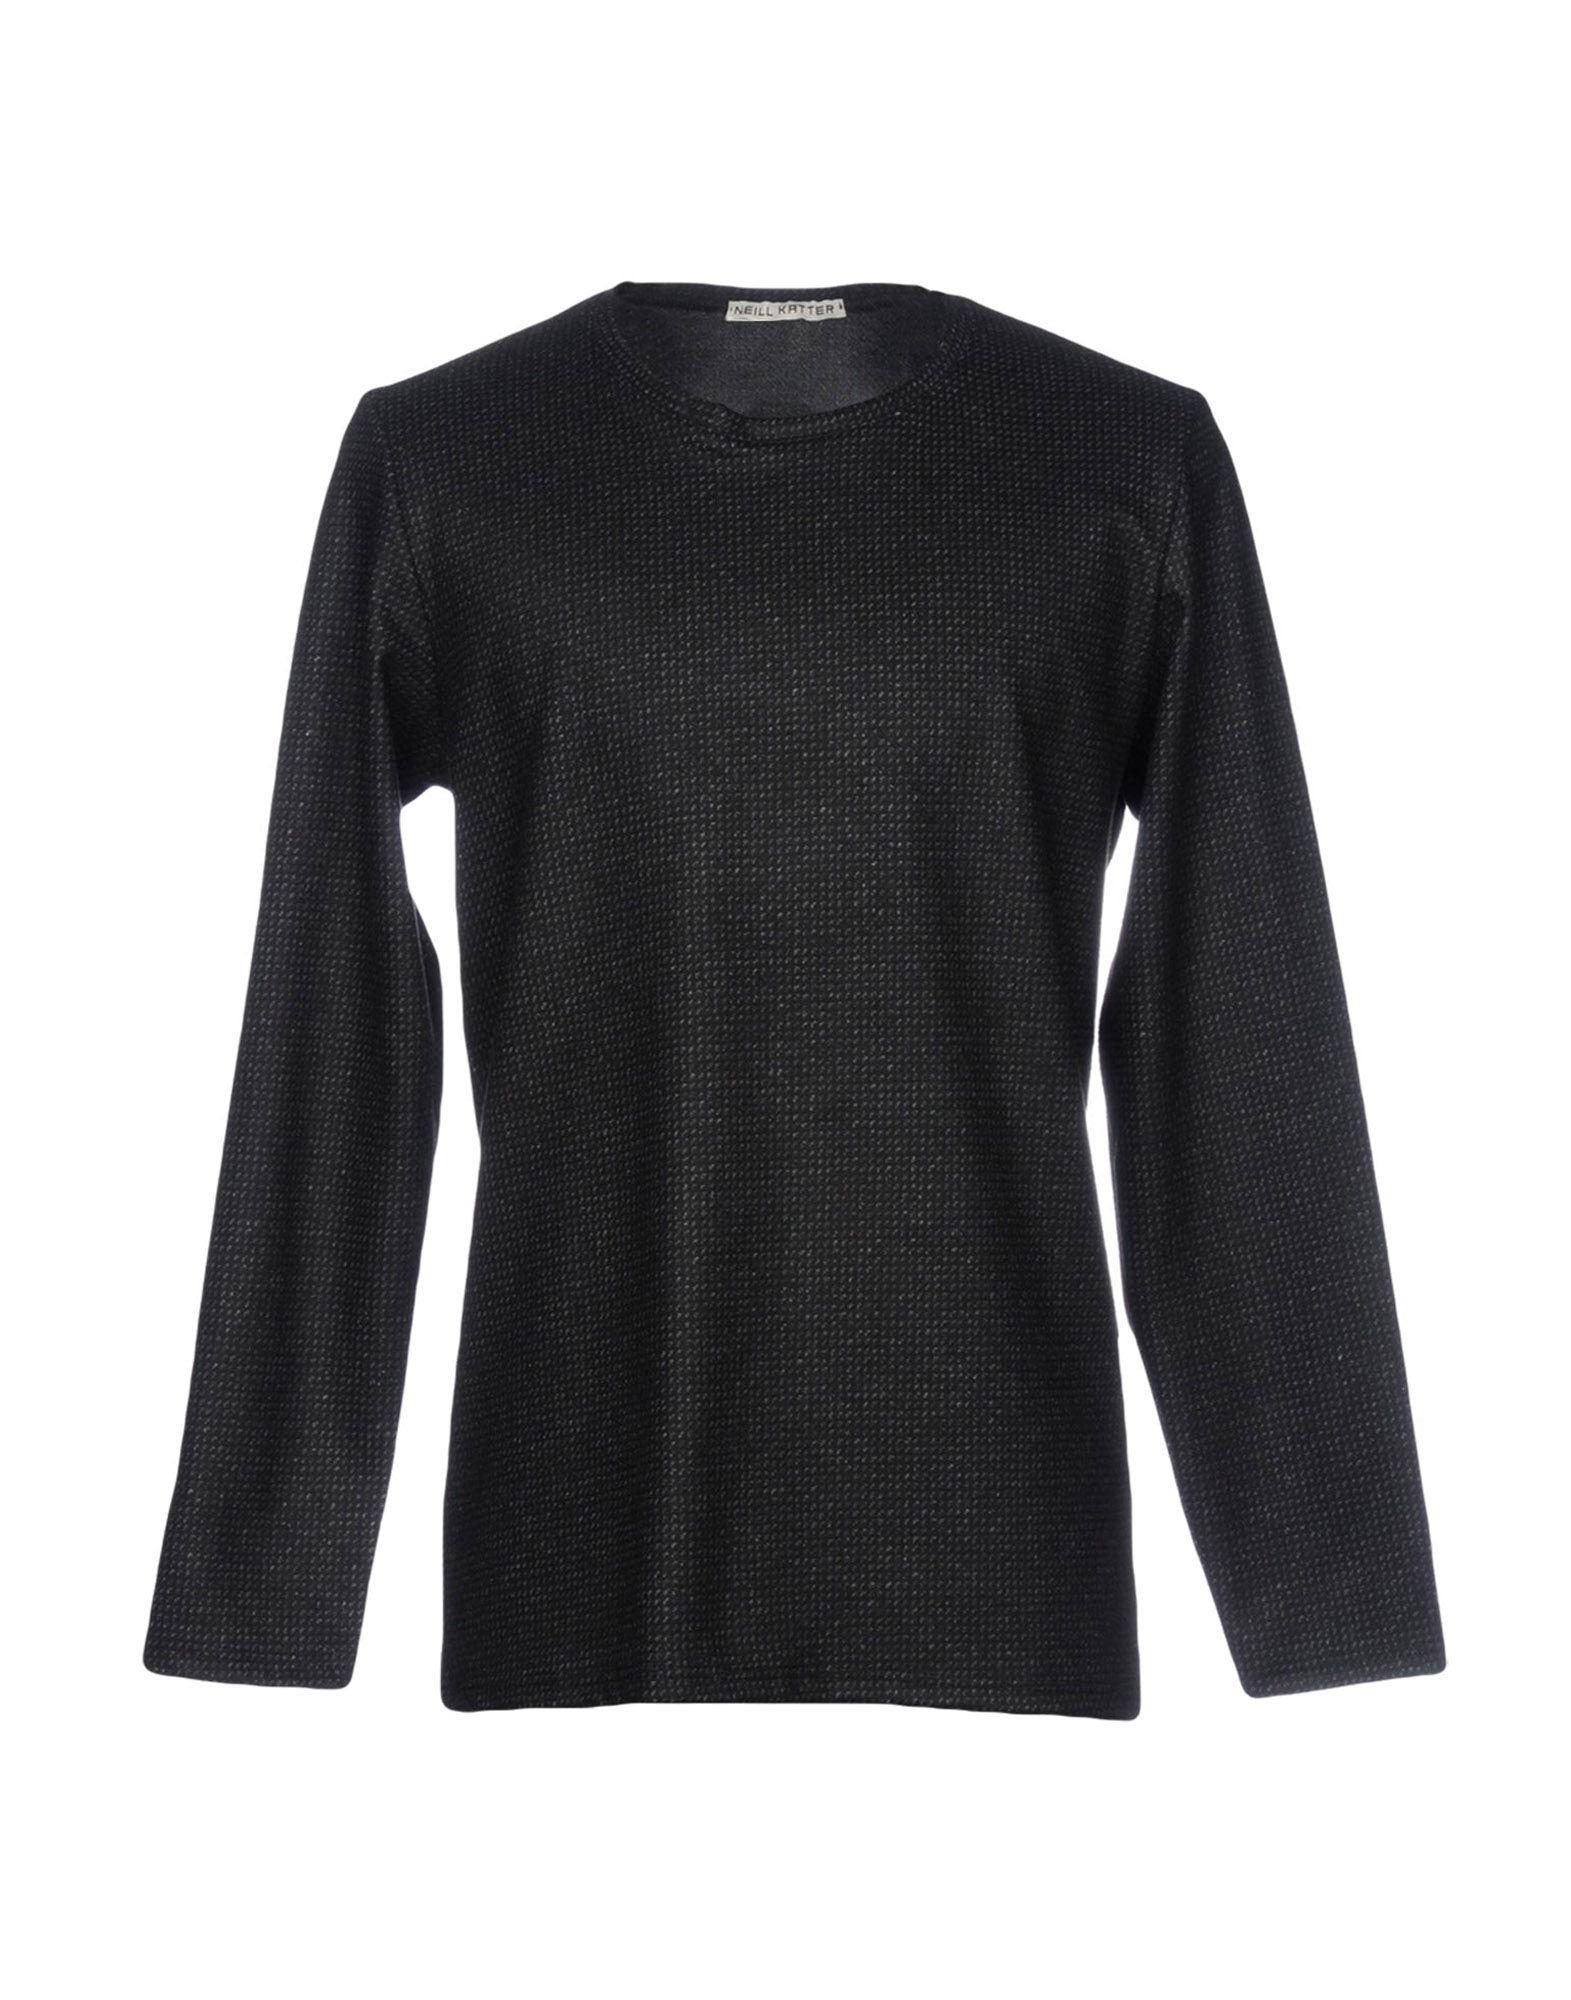 T-Shirt Neill Katter Uomo - 39876012CW 39876012CW - 2effbd